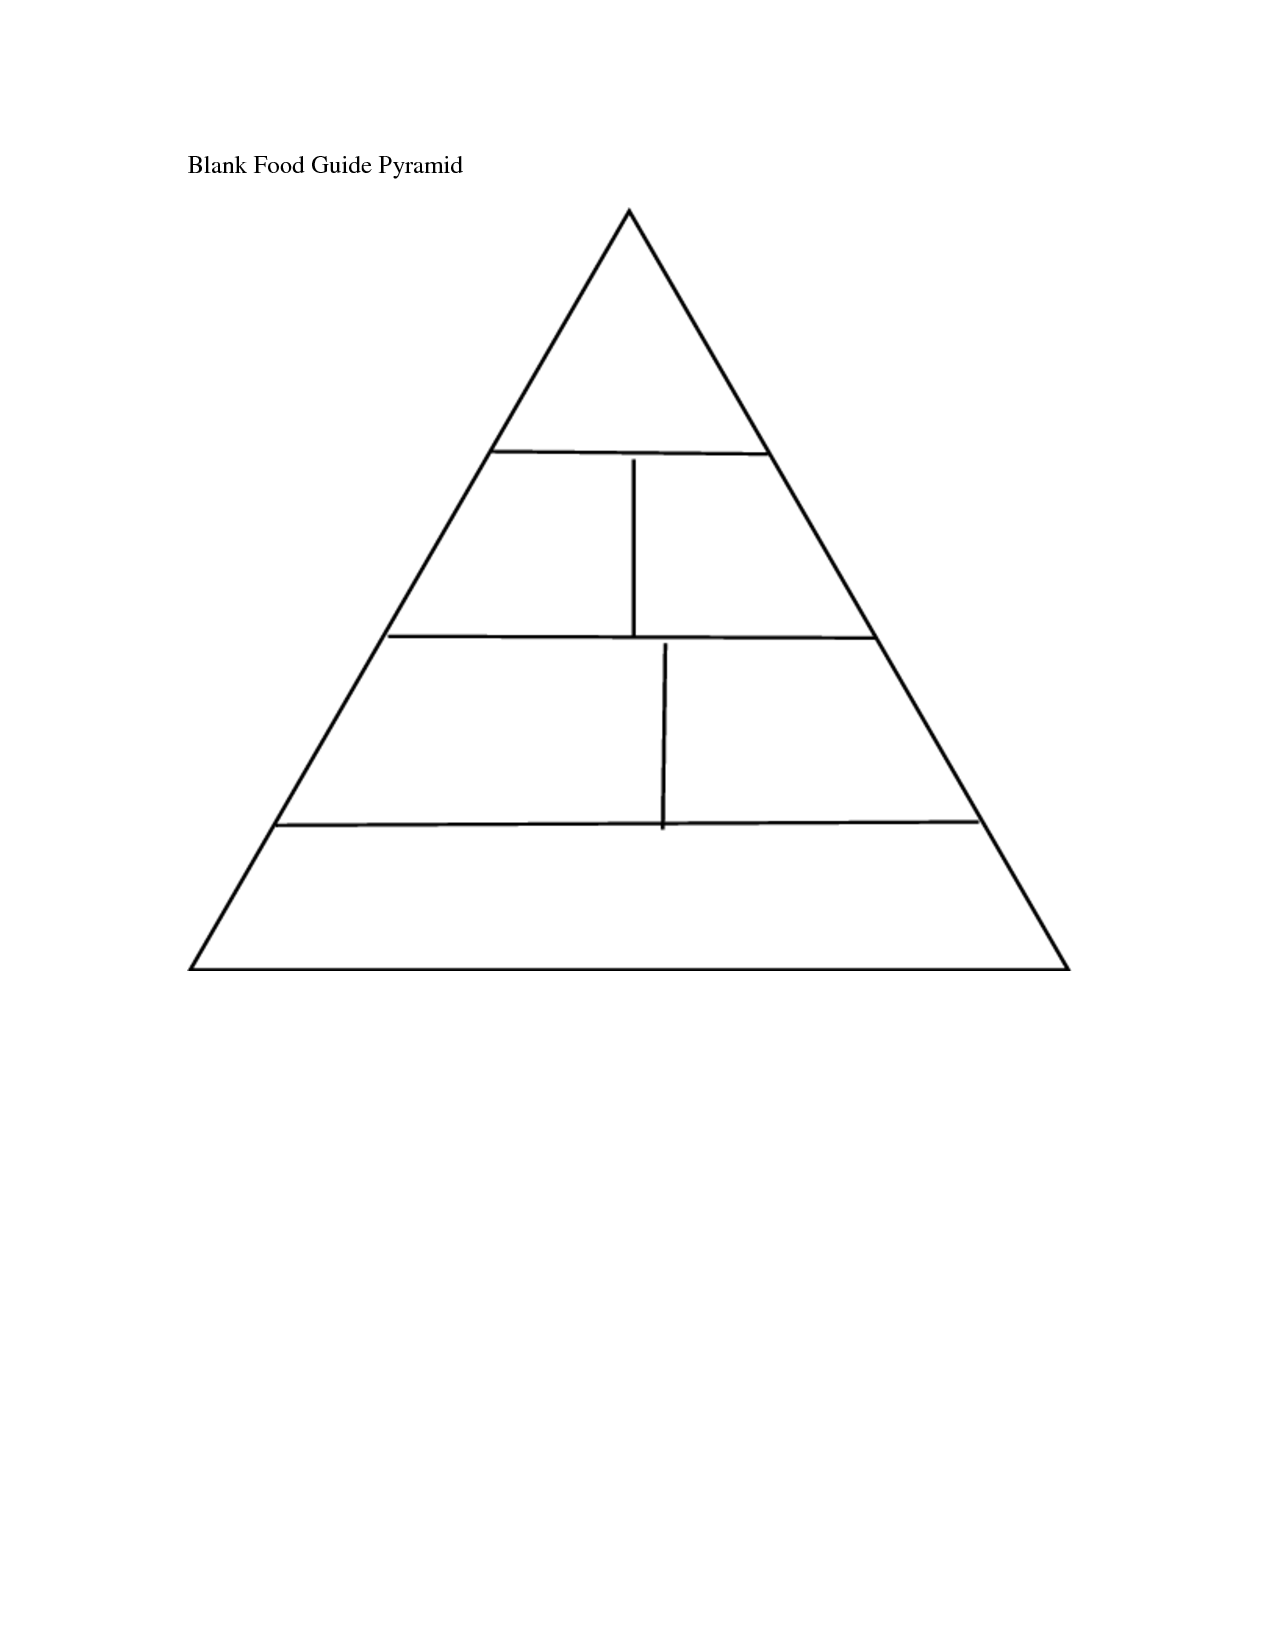 blank pyramid diagram 5 1998 pontiac sunfire radio wiring 14 best images of food guide worksheet